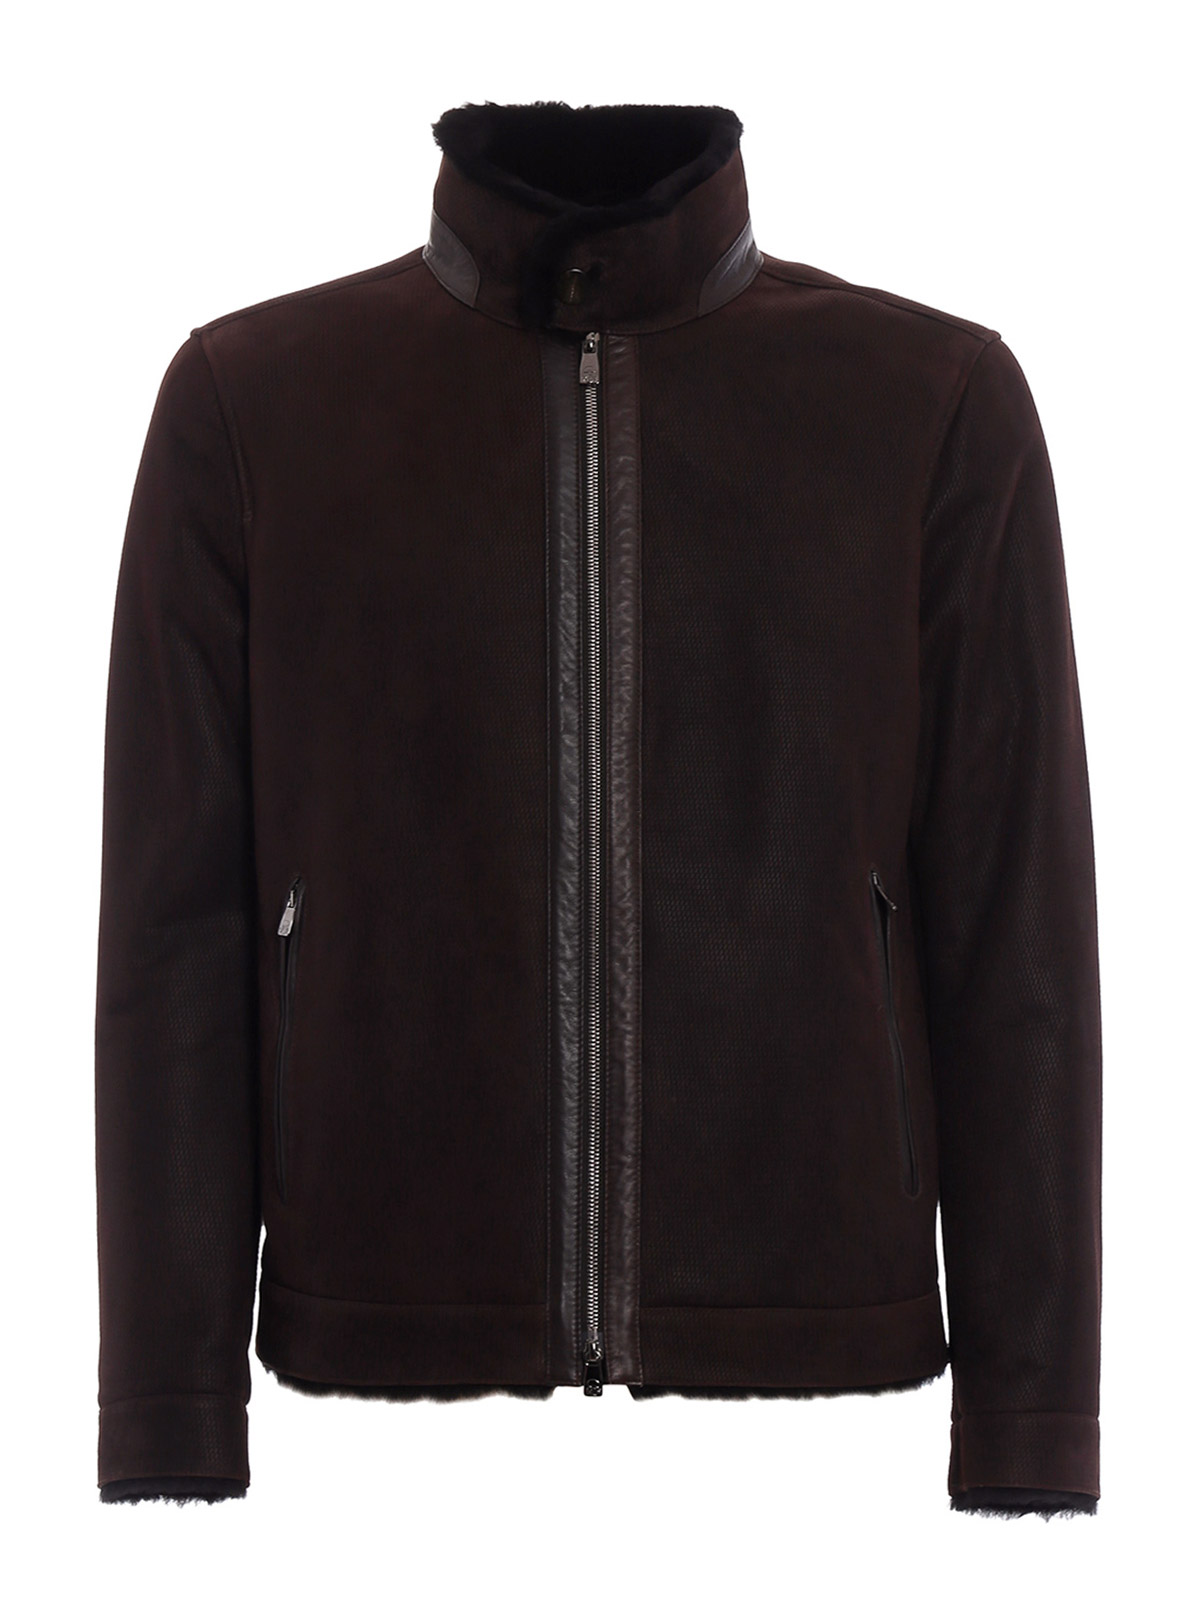 Picture of CORNELIANI | Men's Shearling Jacket